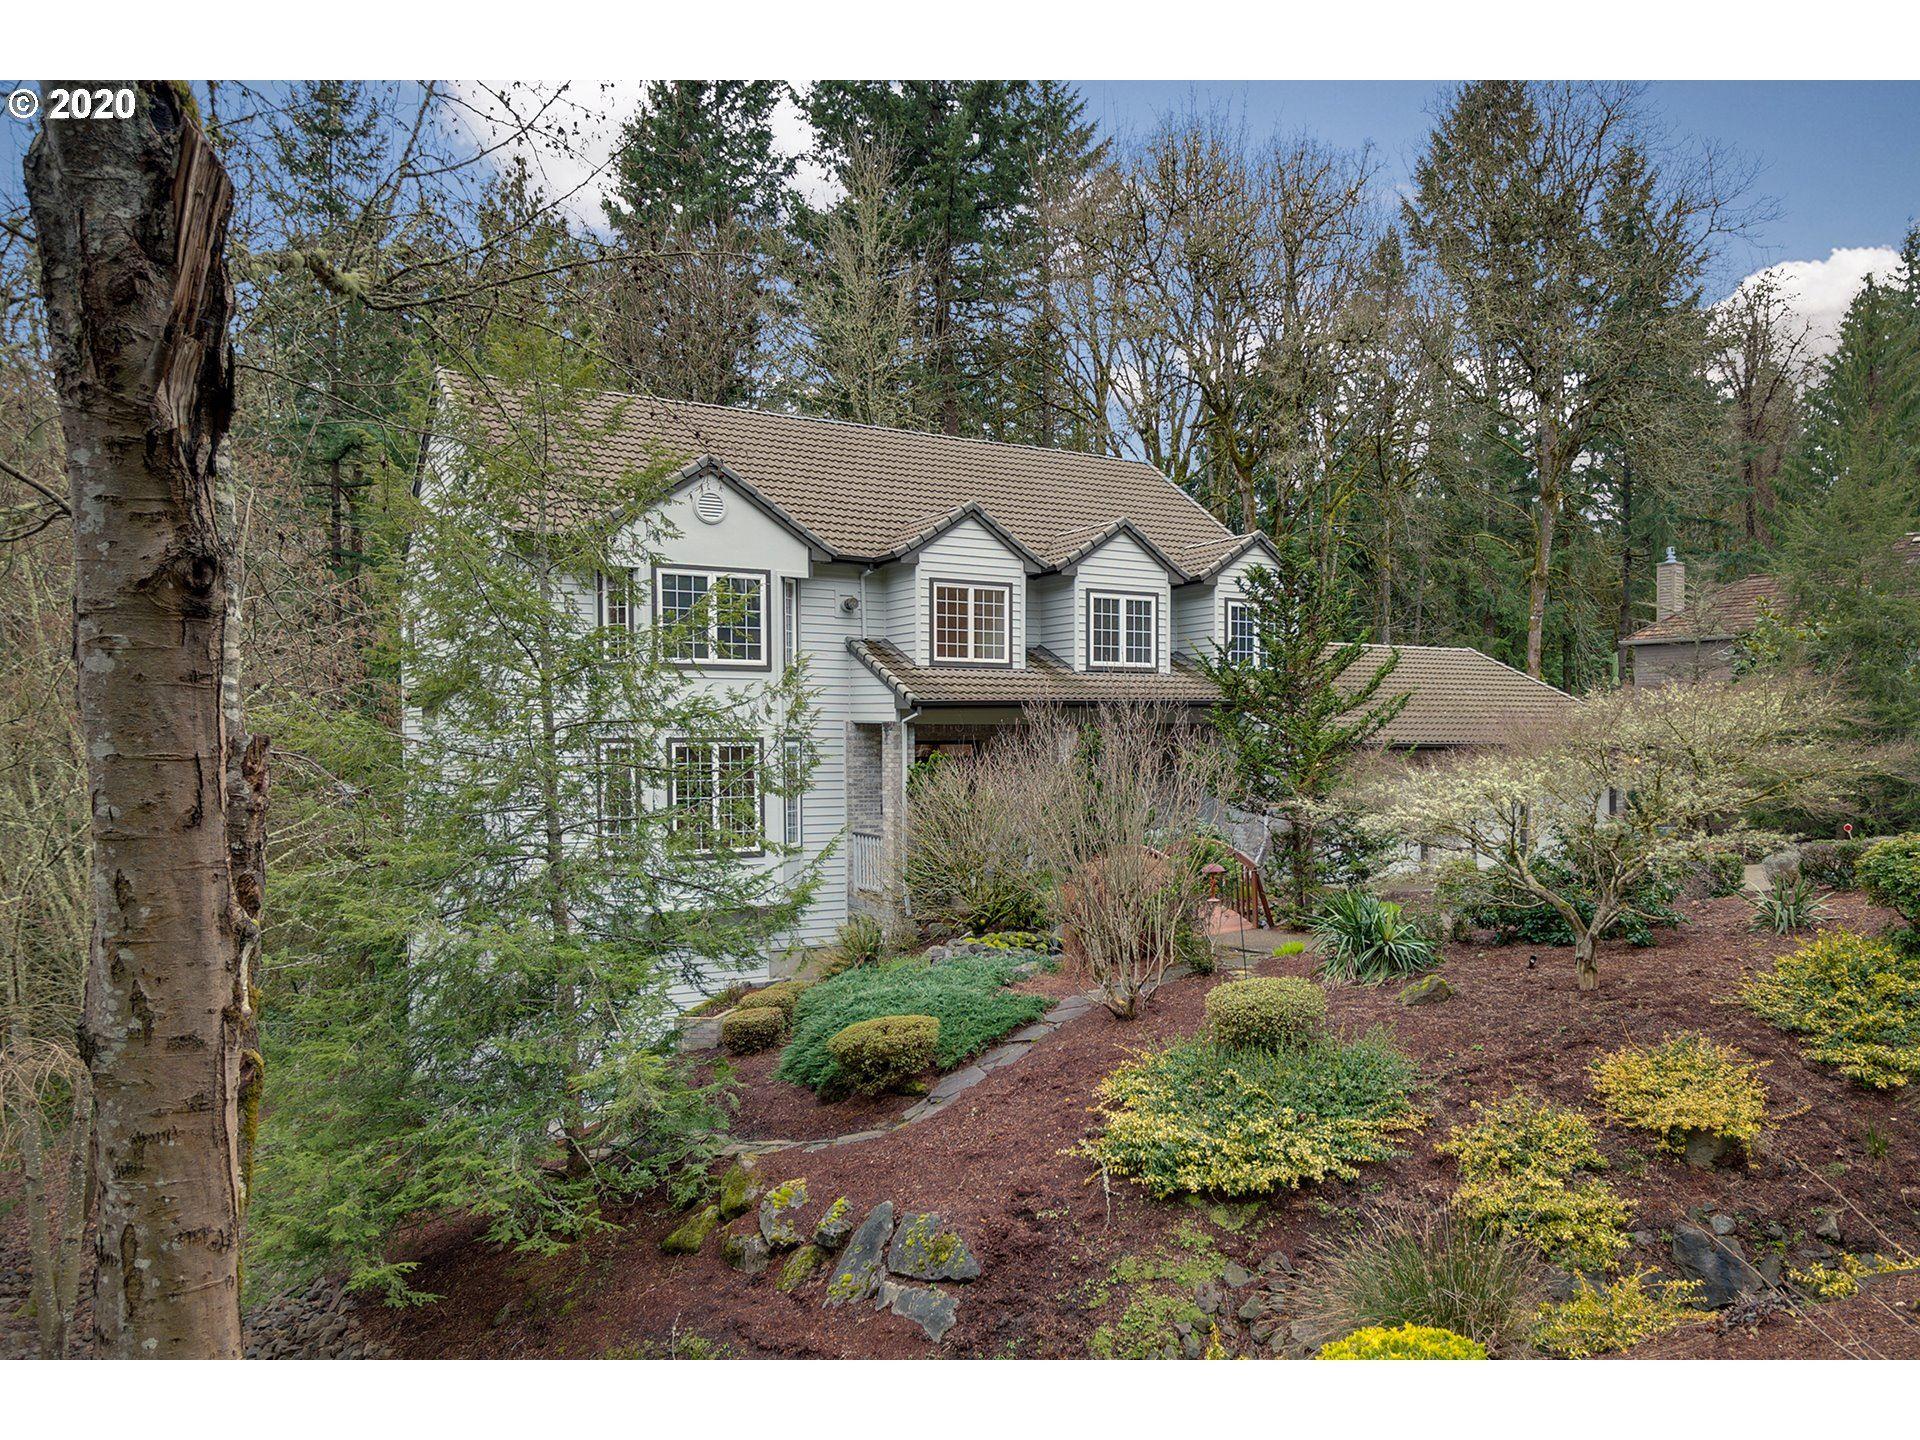 11127 SW SOUTHRIDGE DR, Portland, OR 97219 - MLS#: 20421857